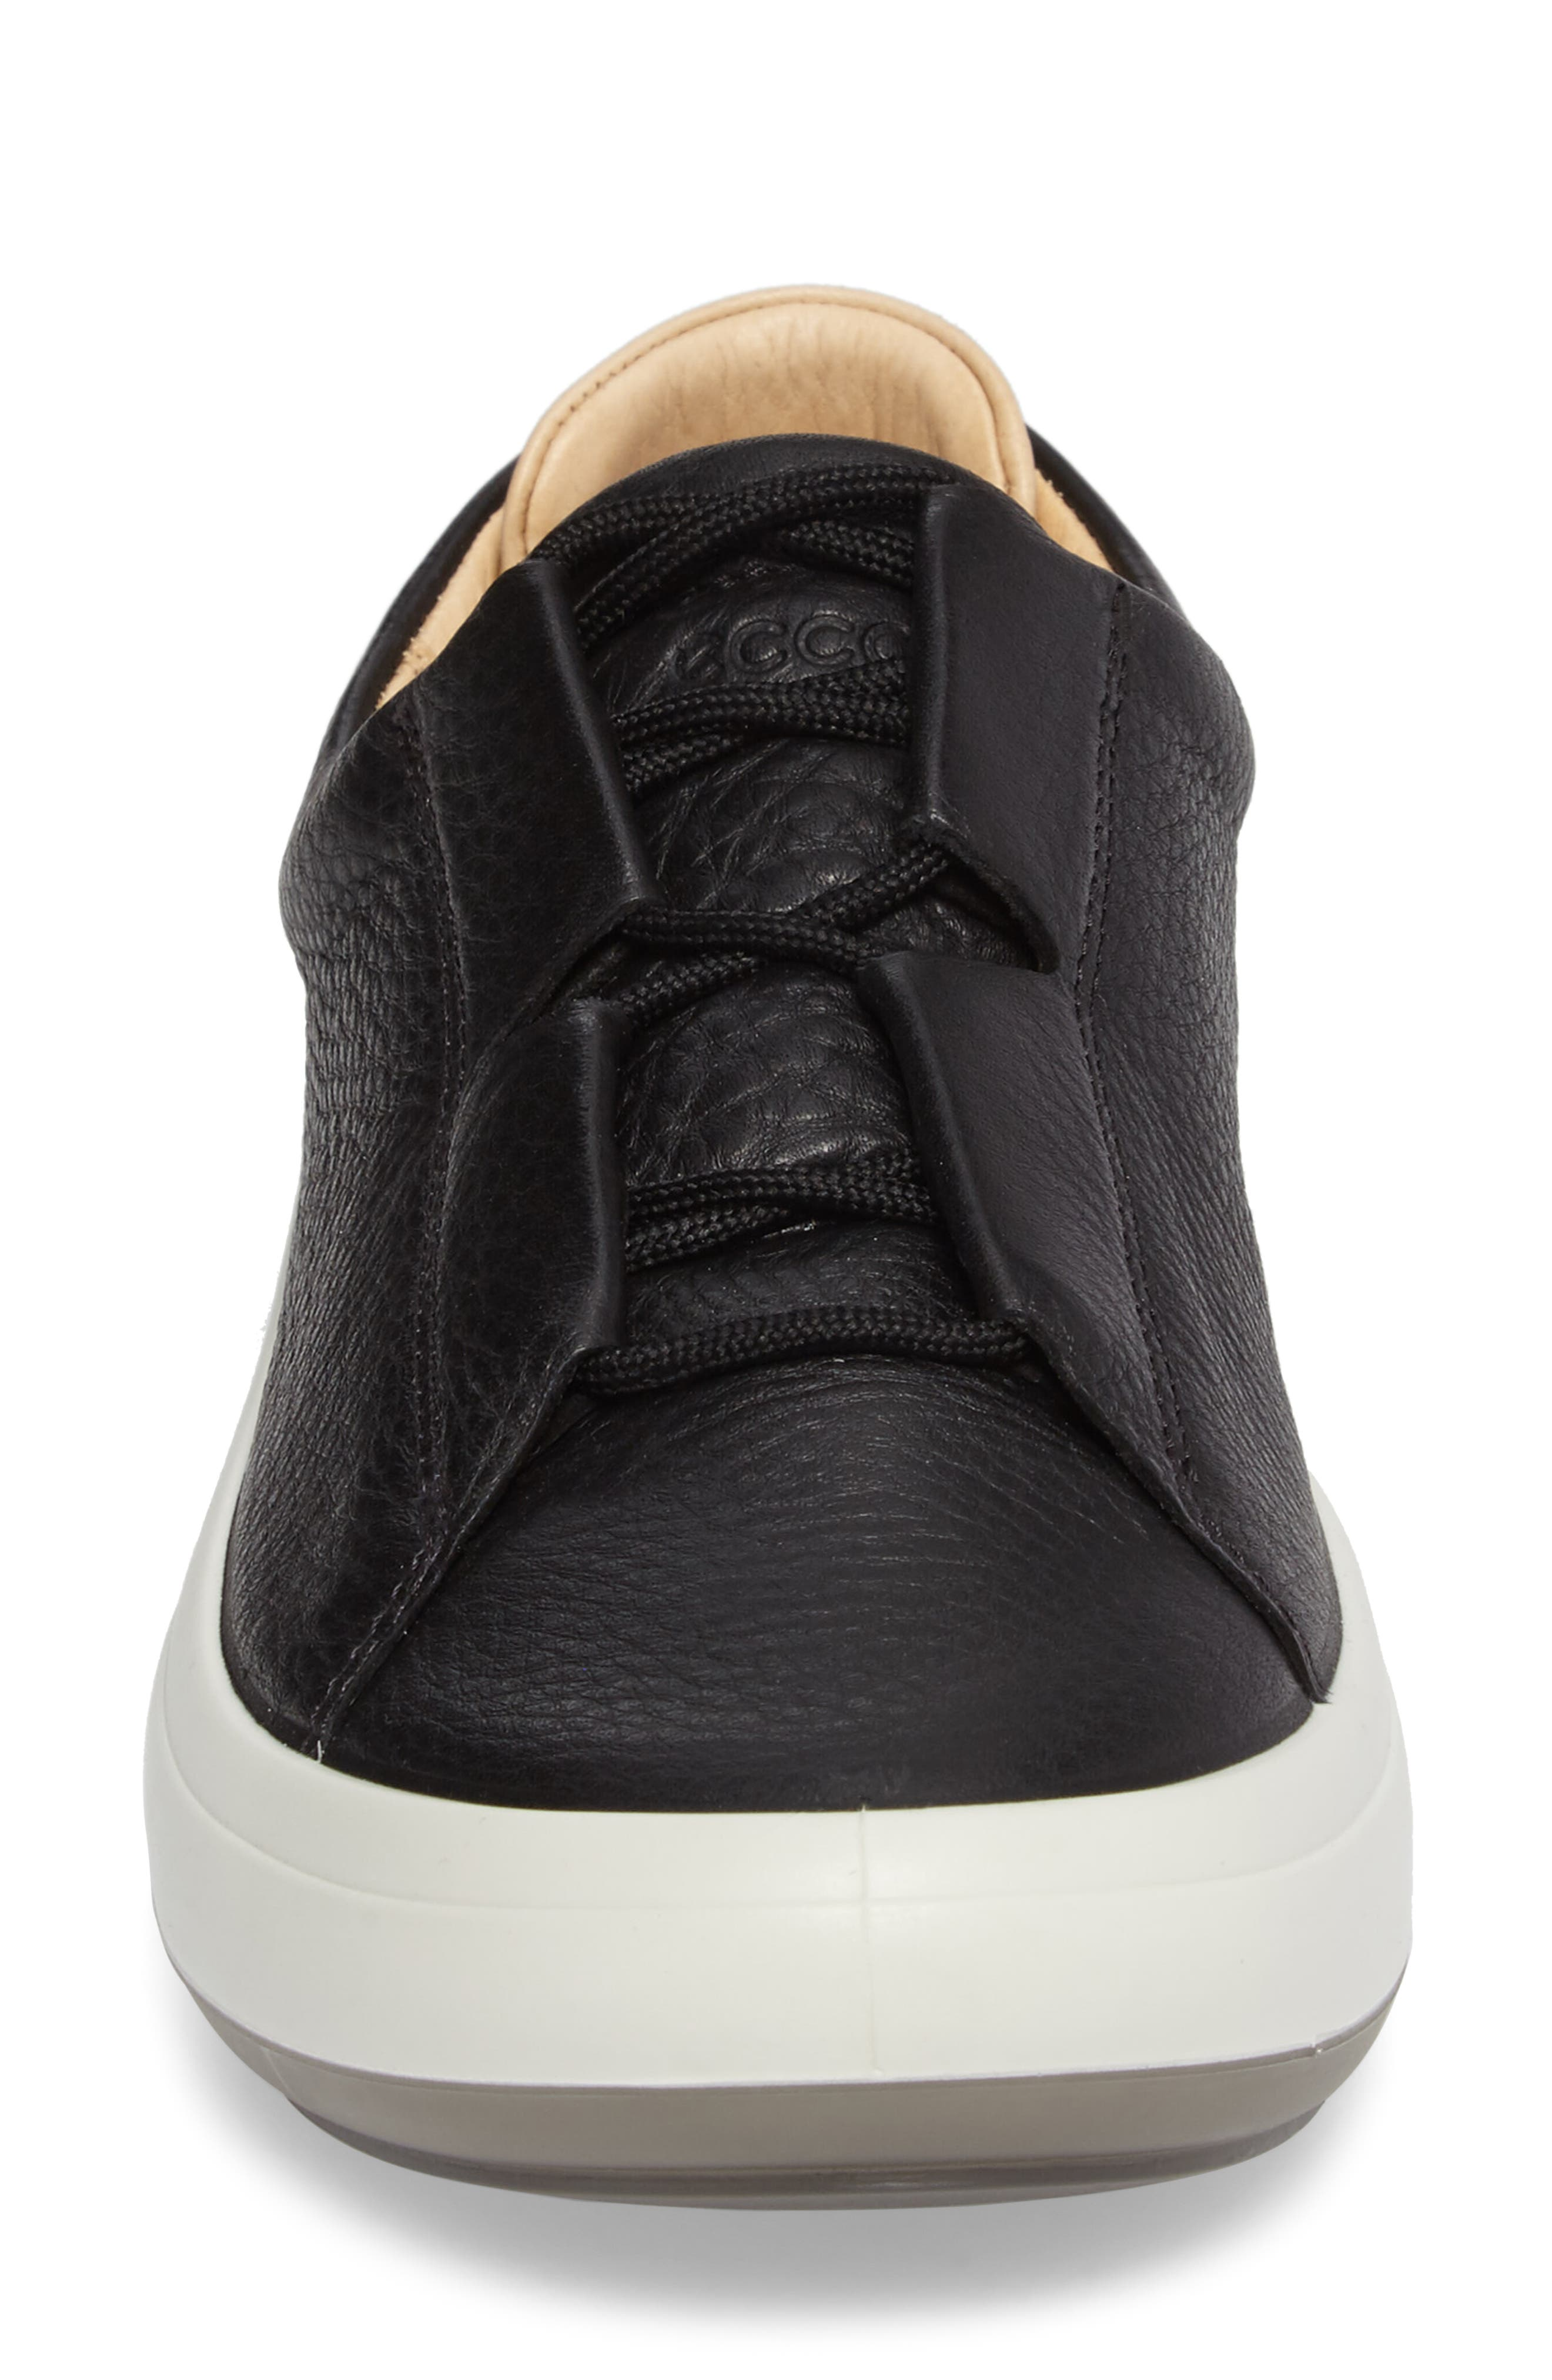 Kinhin Low Top Sneaker,                             Alternate thumbnail 4, color,                             013